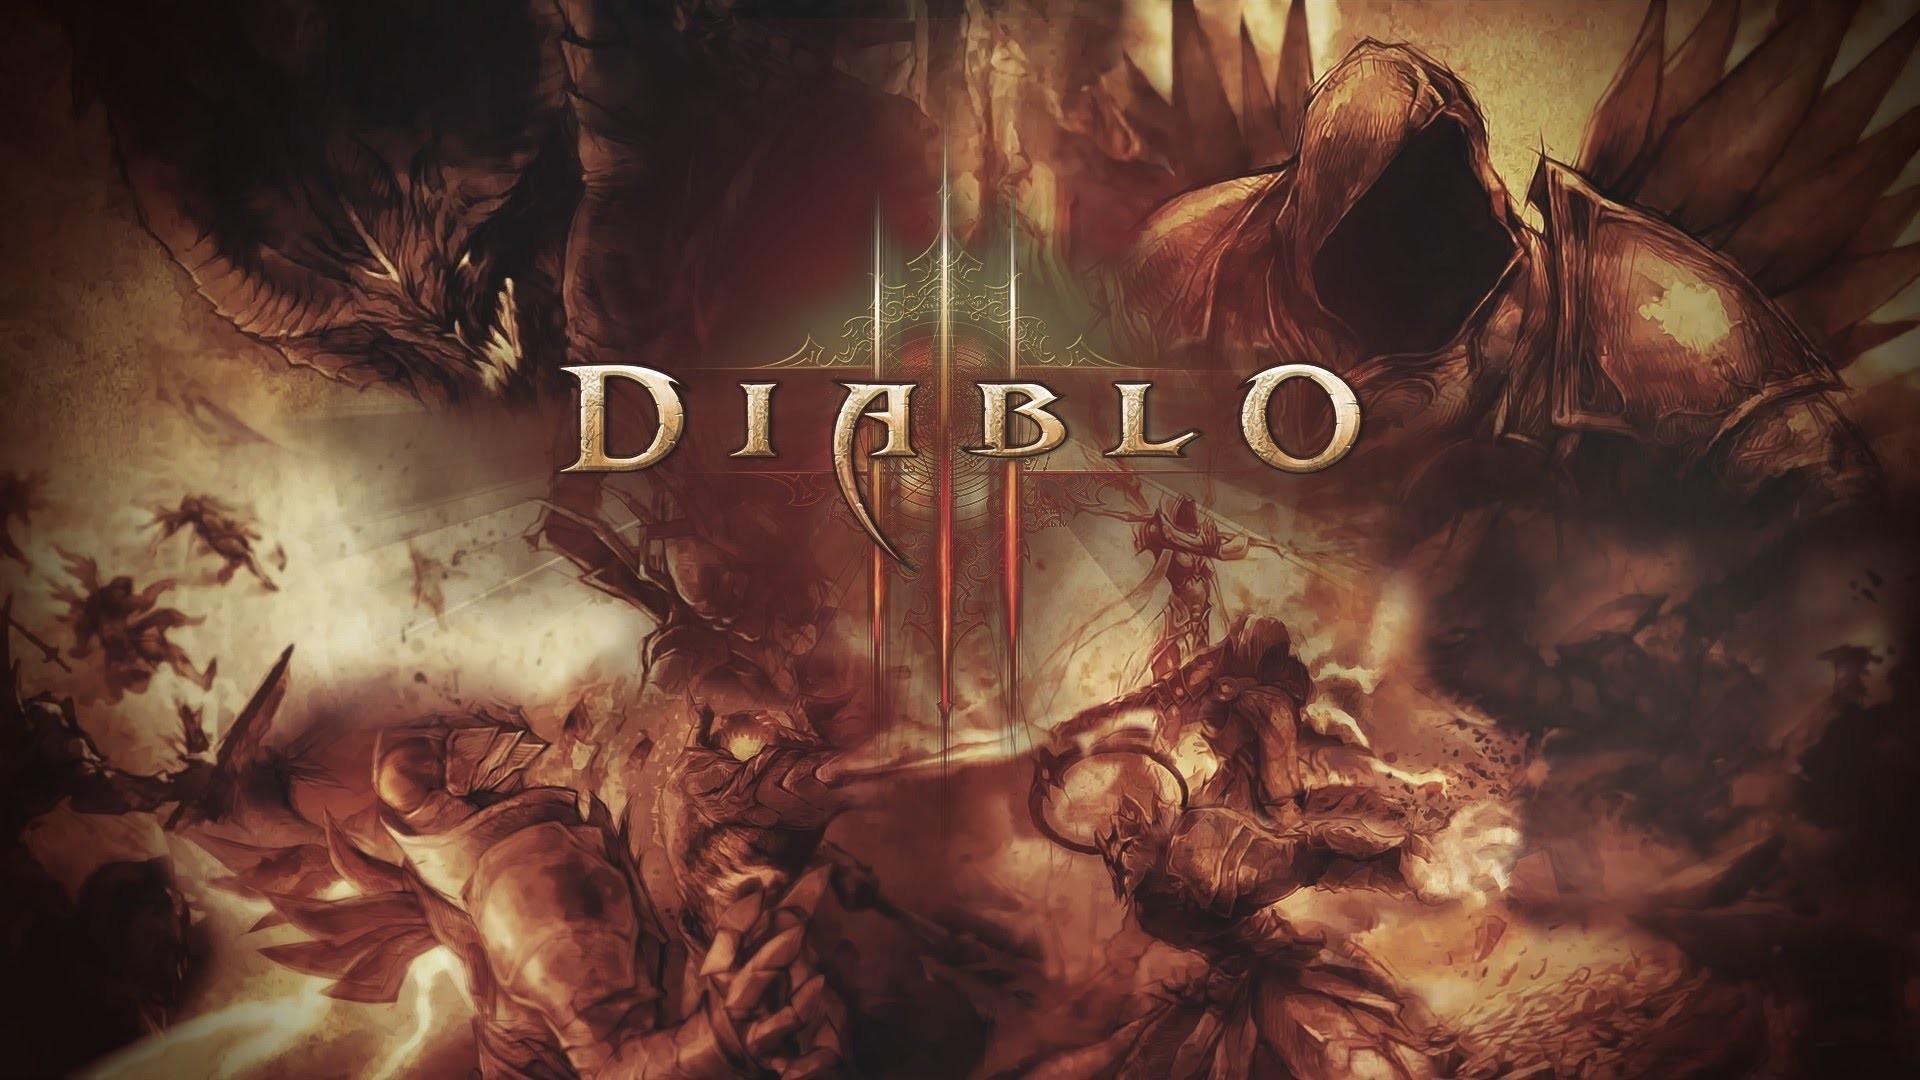 Diablo 3 Wallpaper Angels vs Demons by PT-Desu on DeviantArt